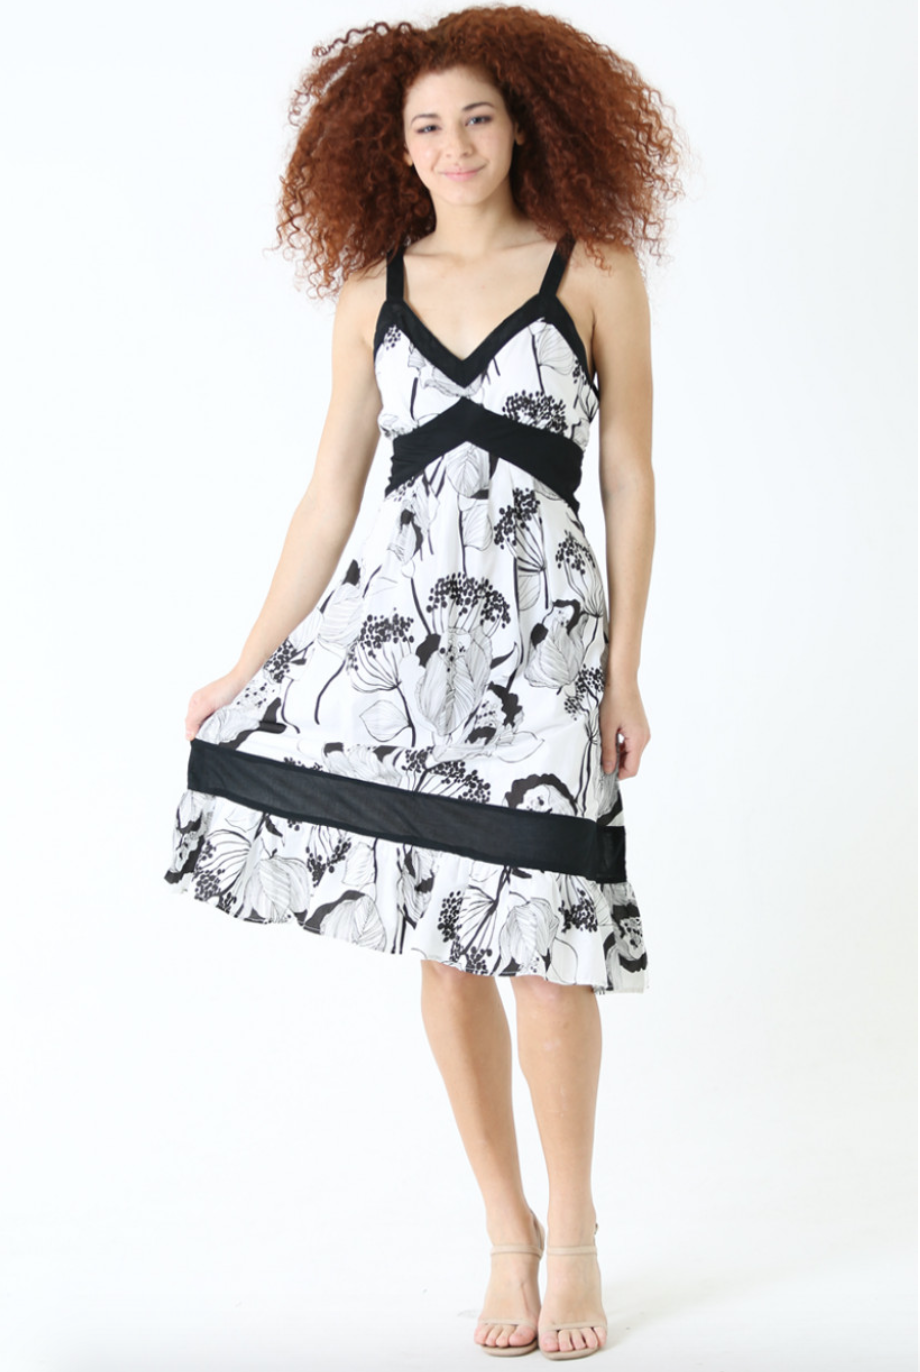 Angie B&W Sun dress